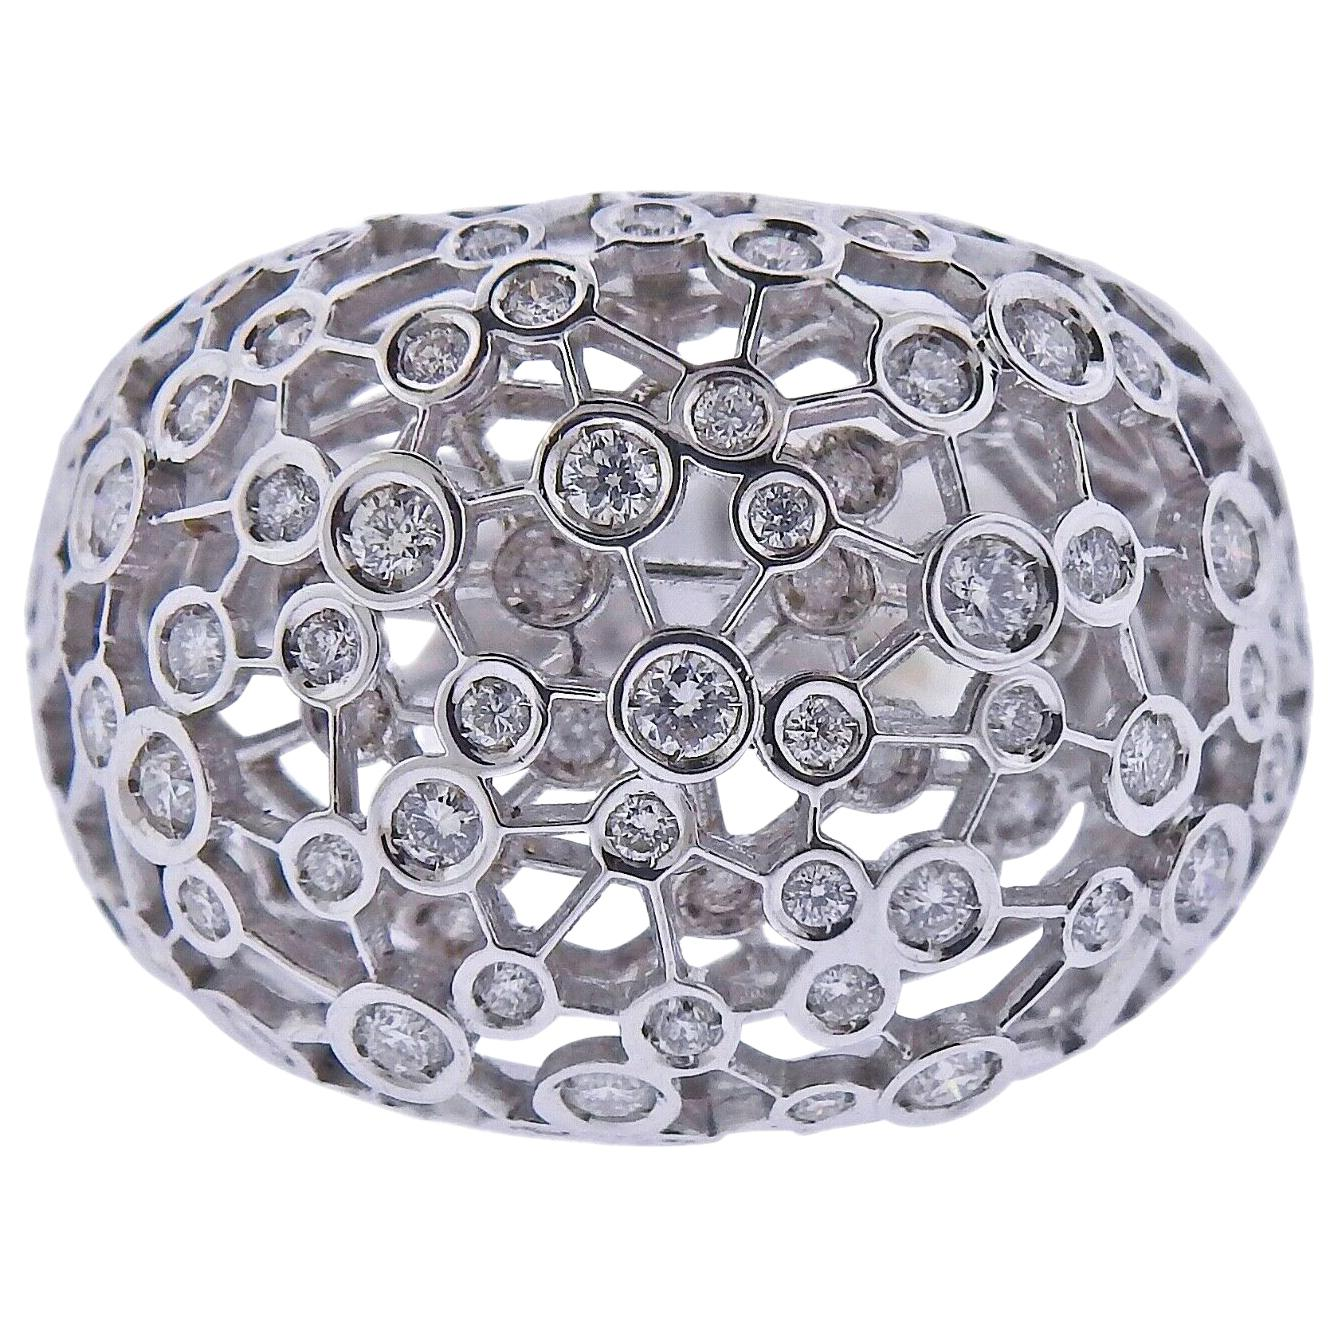 New Damiani Diamond Gold Dome Ring